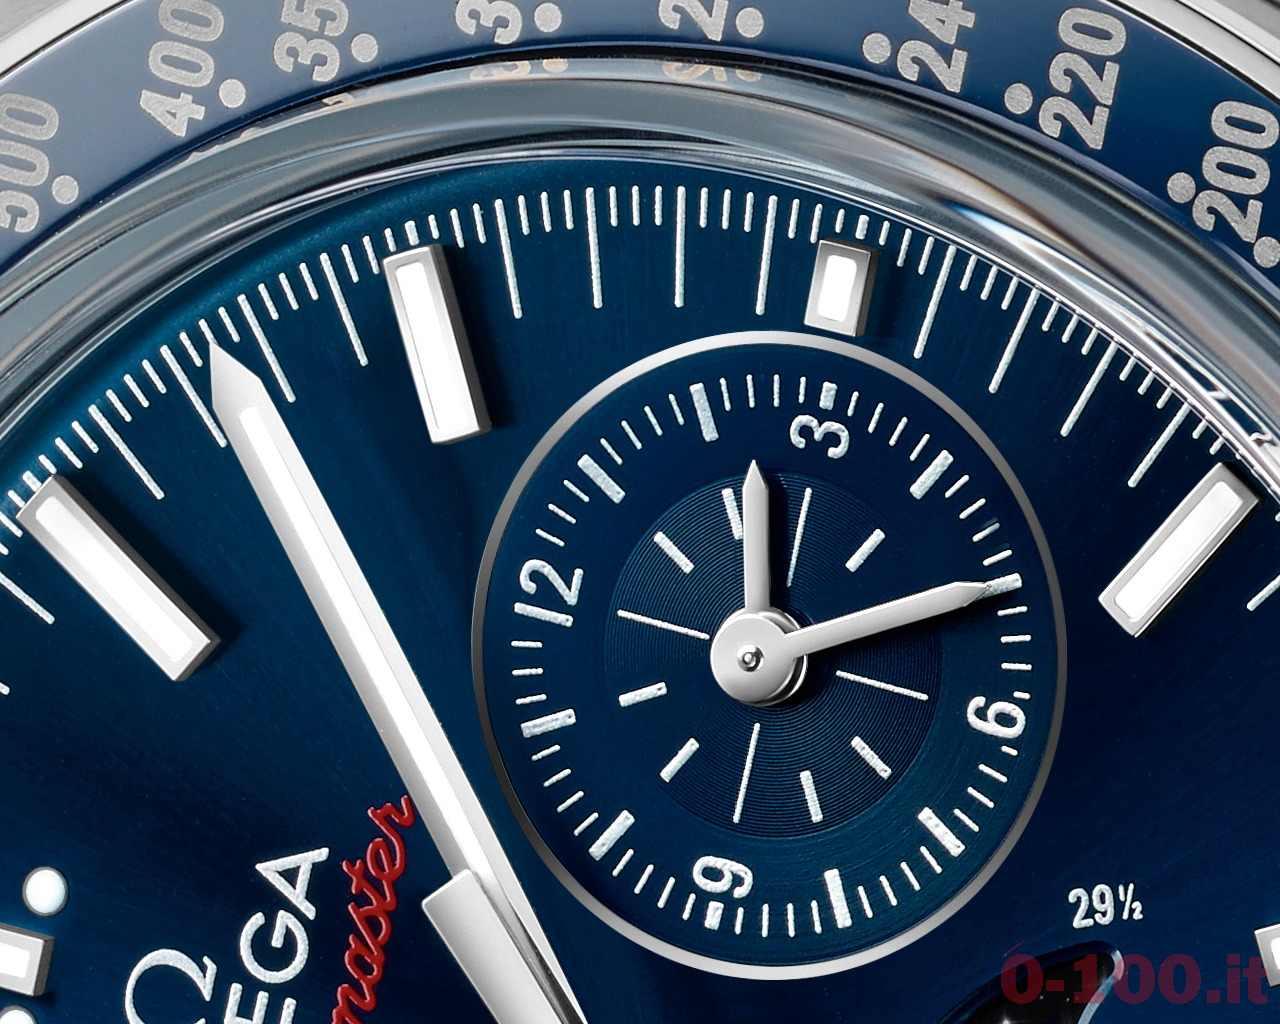 baselworld-2016-omega-speedmaster-moonphase-master-chronometer-ref-304-33-44-52-03-001_0-1005